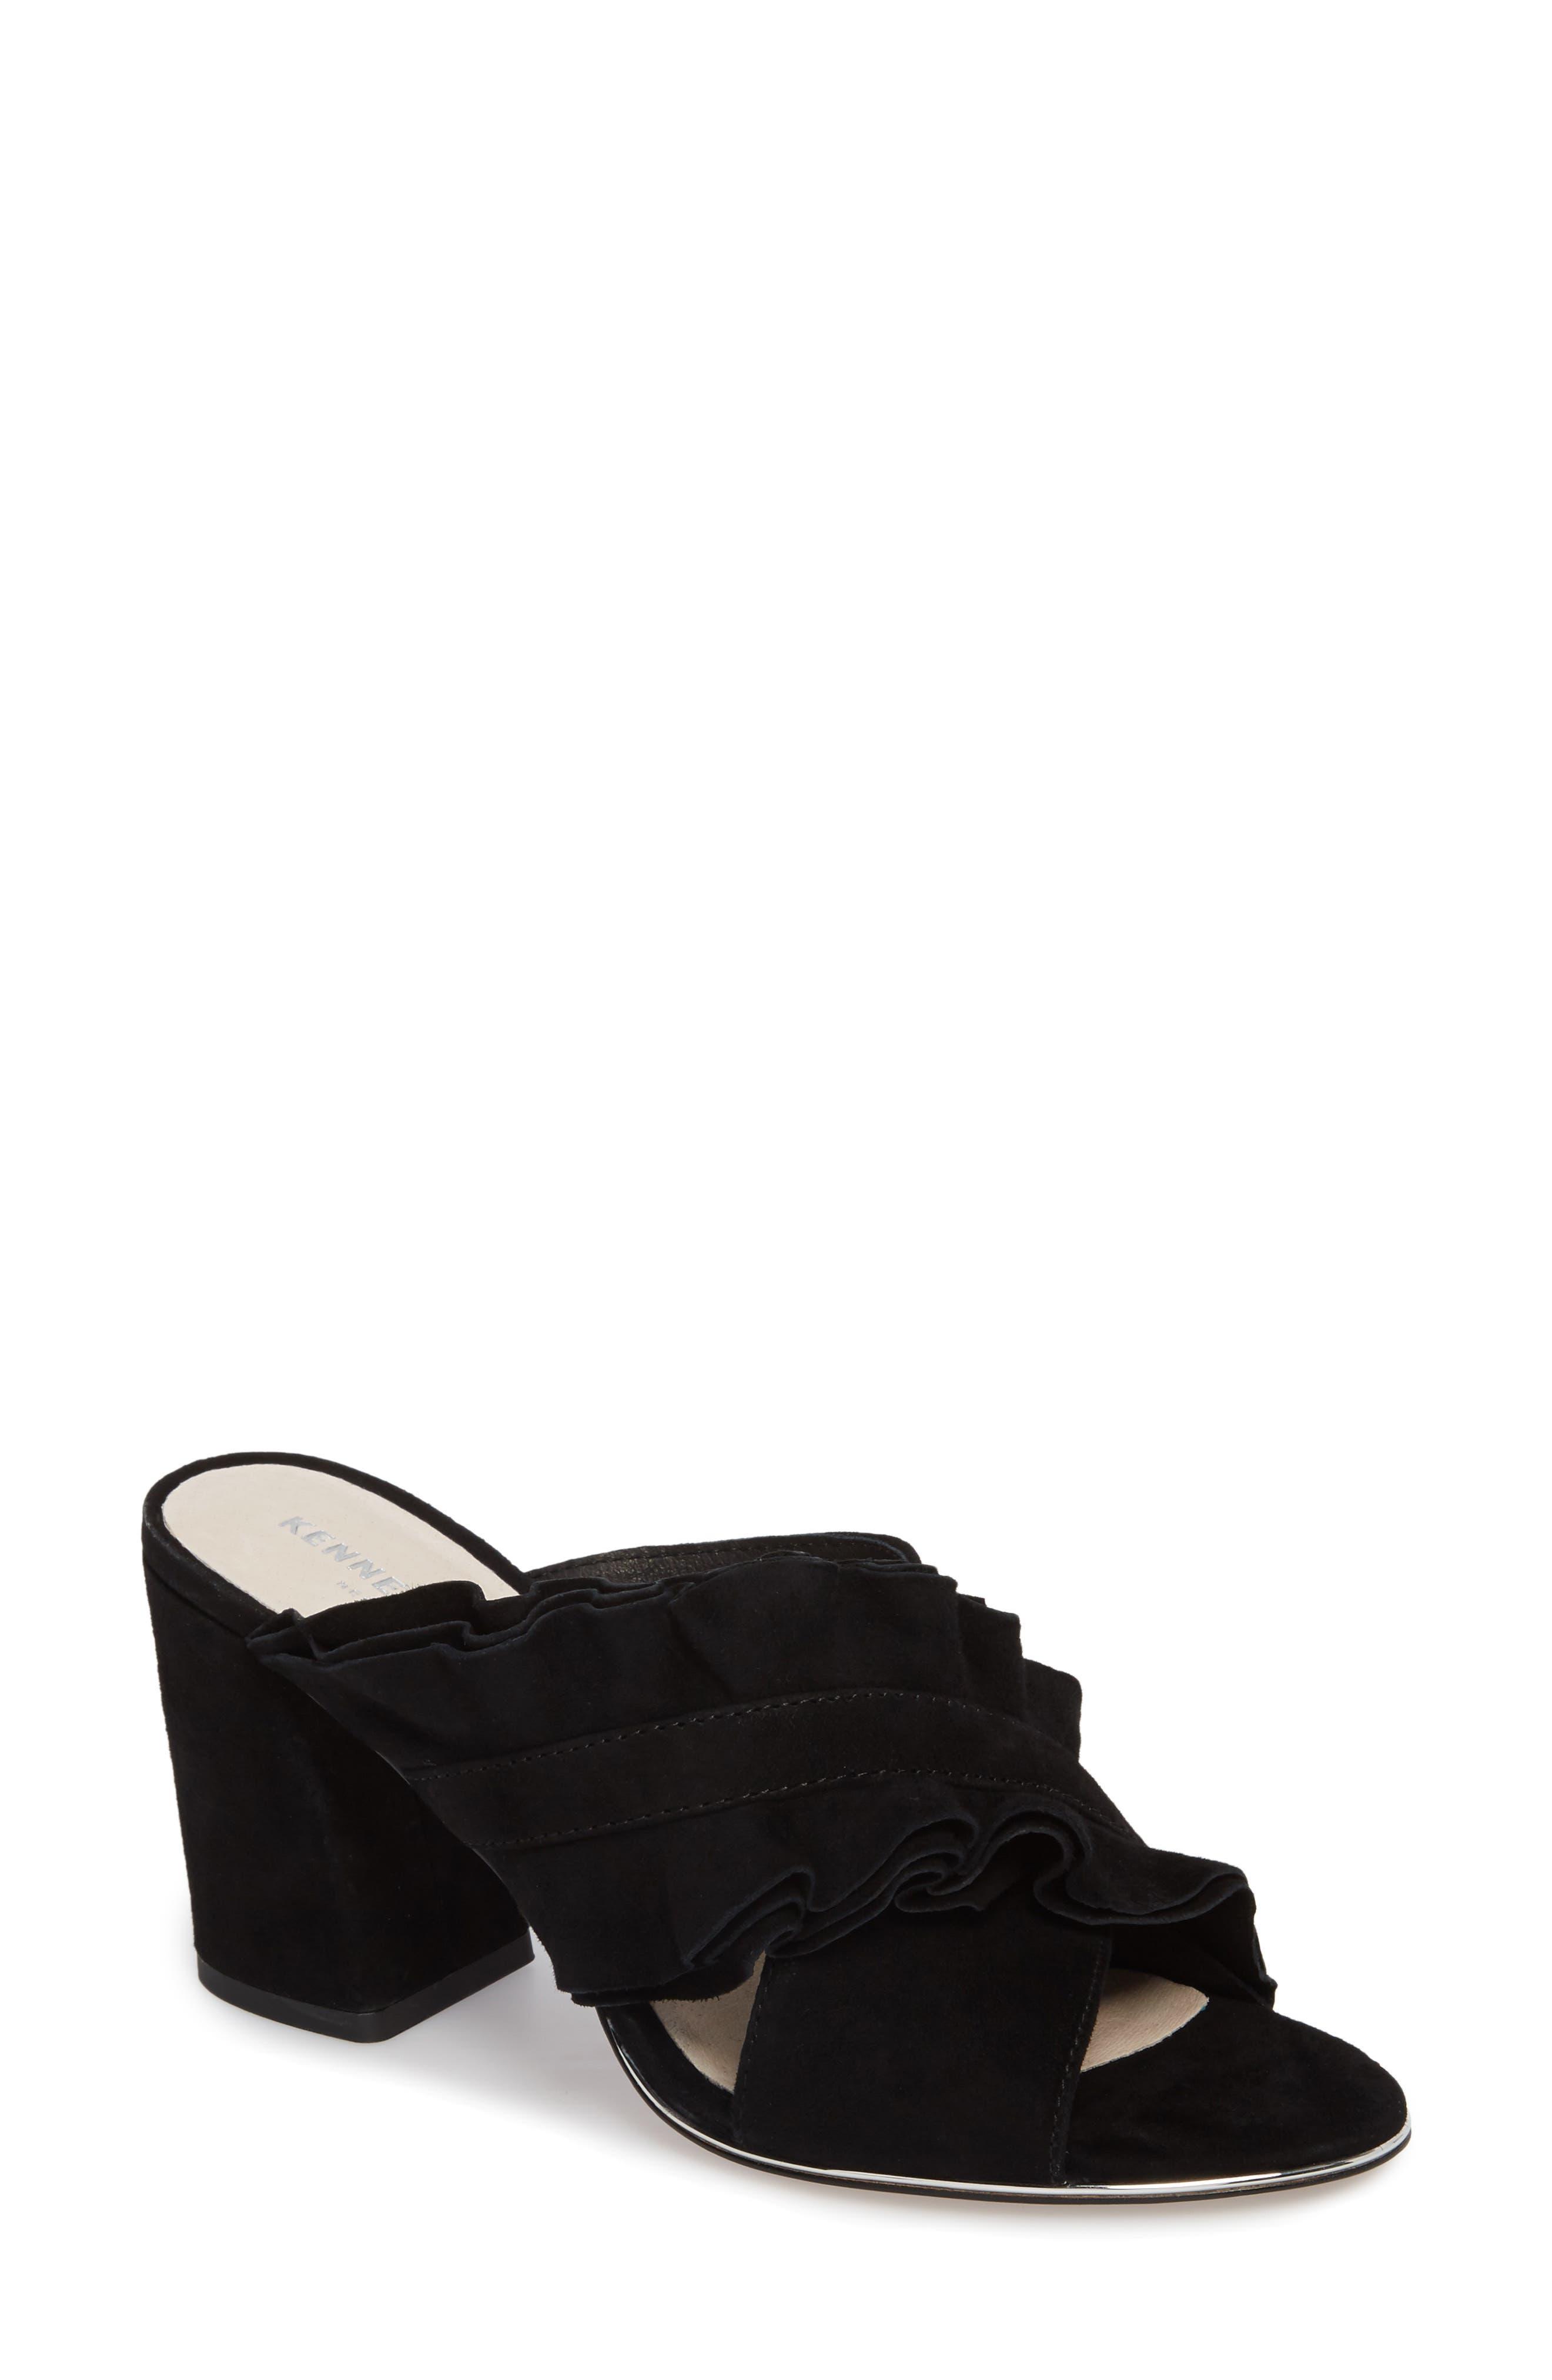 Laken Ruffle Cross Strap Sandal,                         Main,                         color, 001